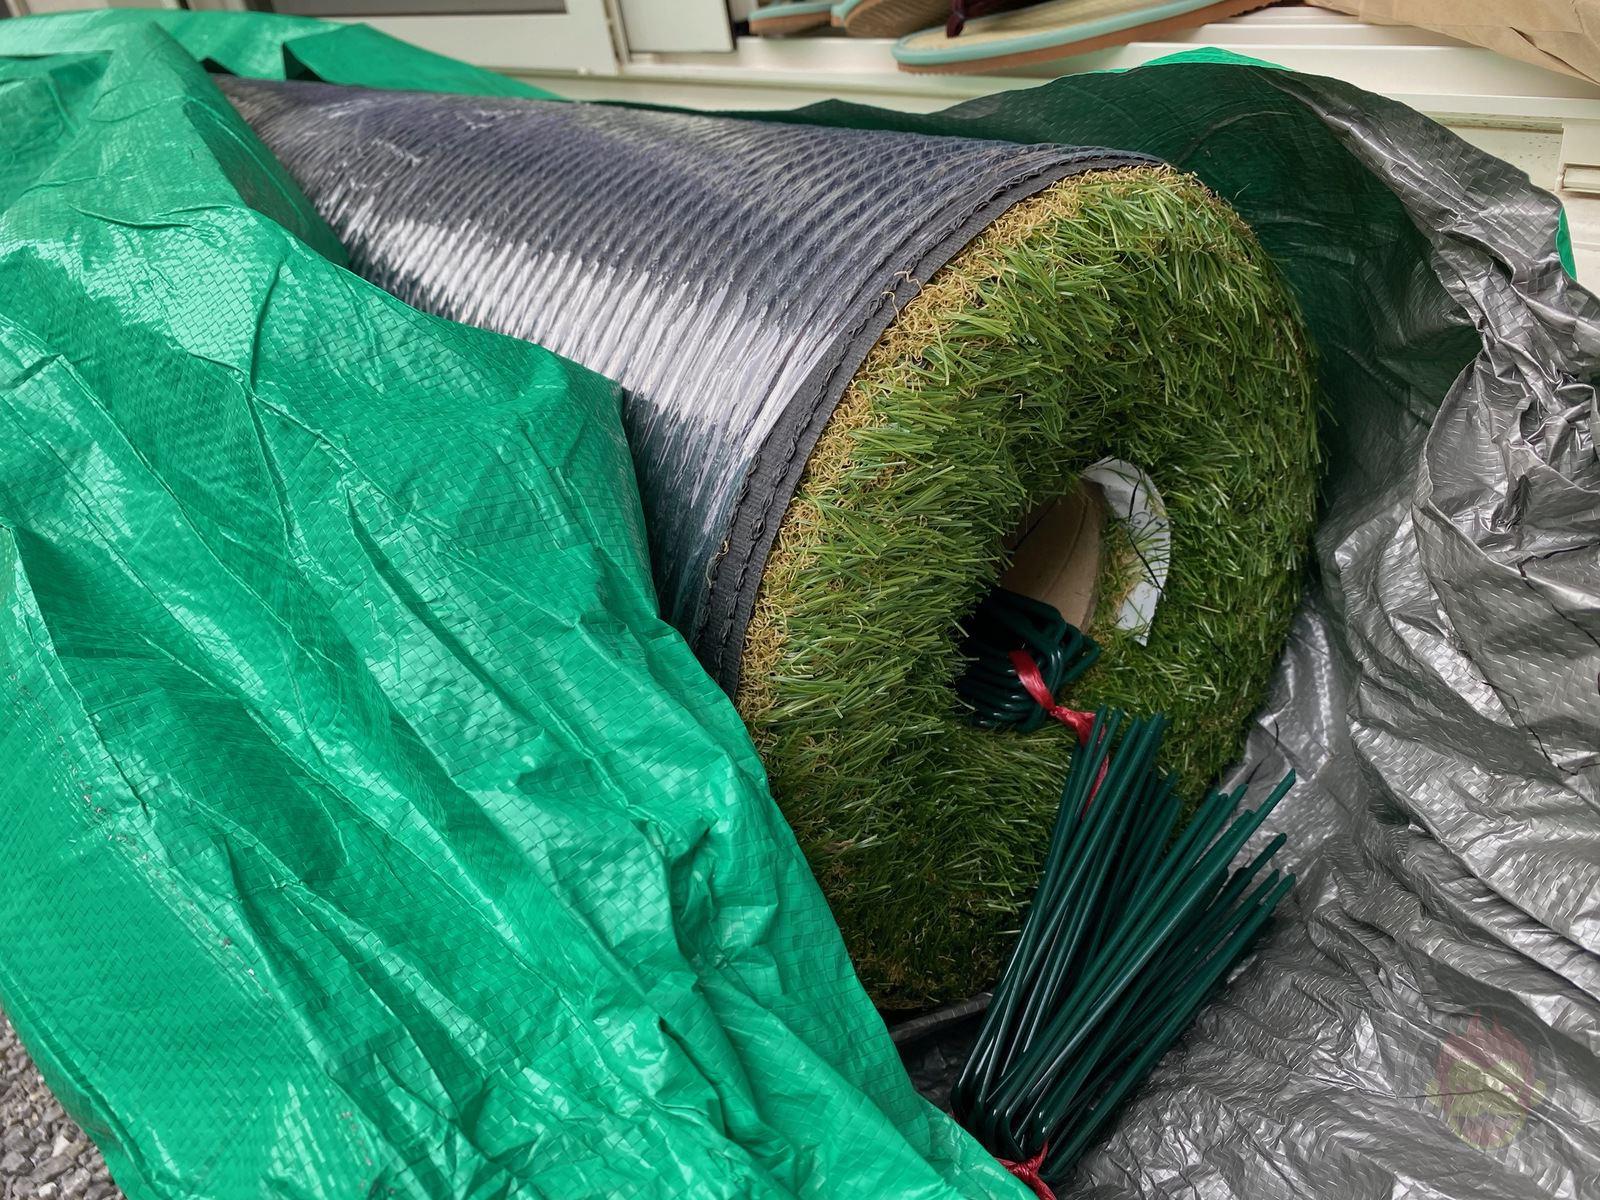 Artificial-lawn-in-backyard-review-04.jpeg